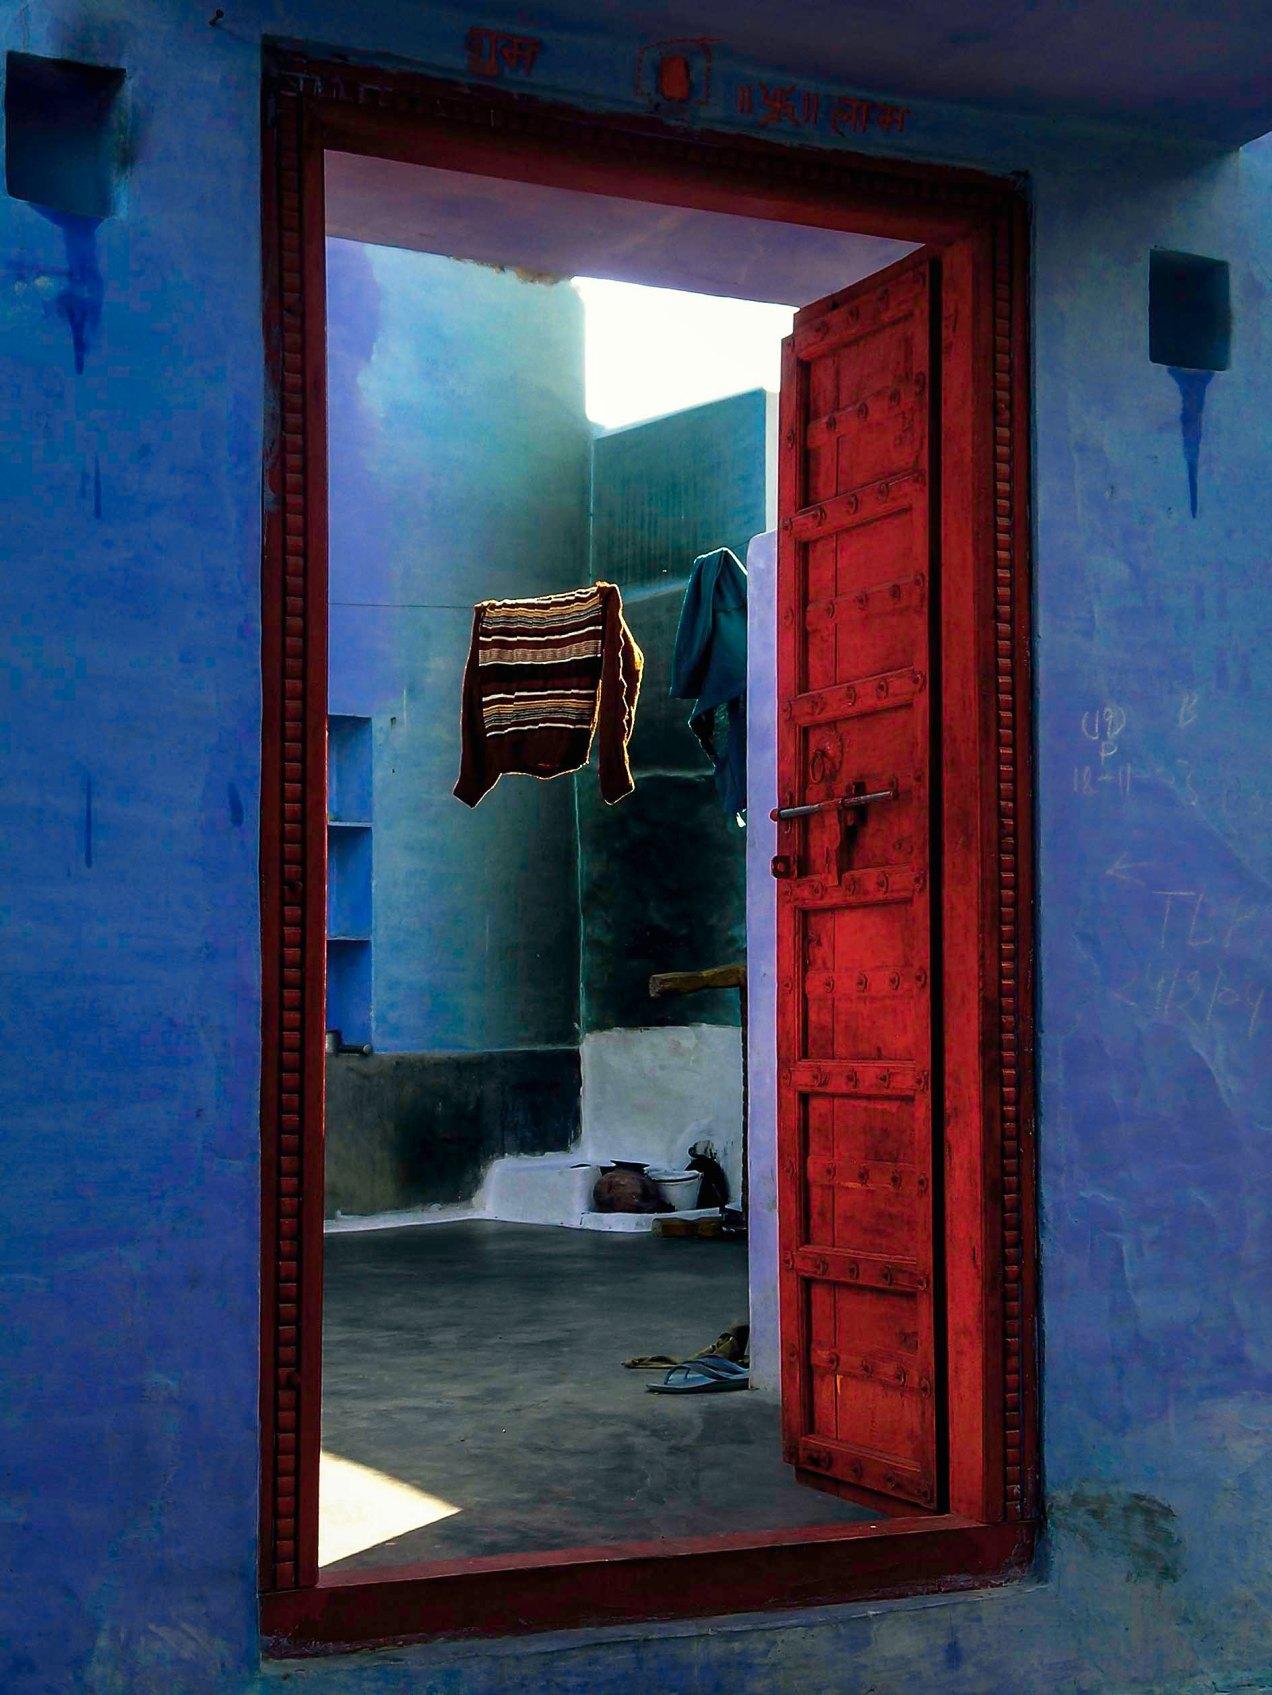 Cour Kishangarh, Jodhpur, Inde, gildalliere, 2004